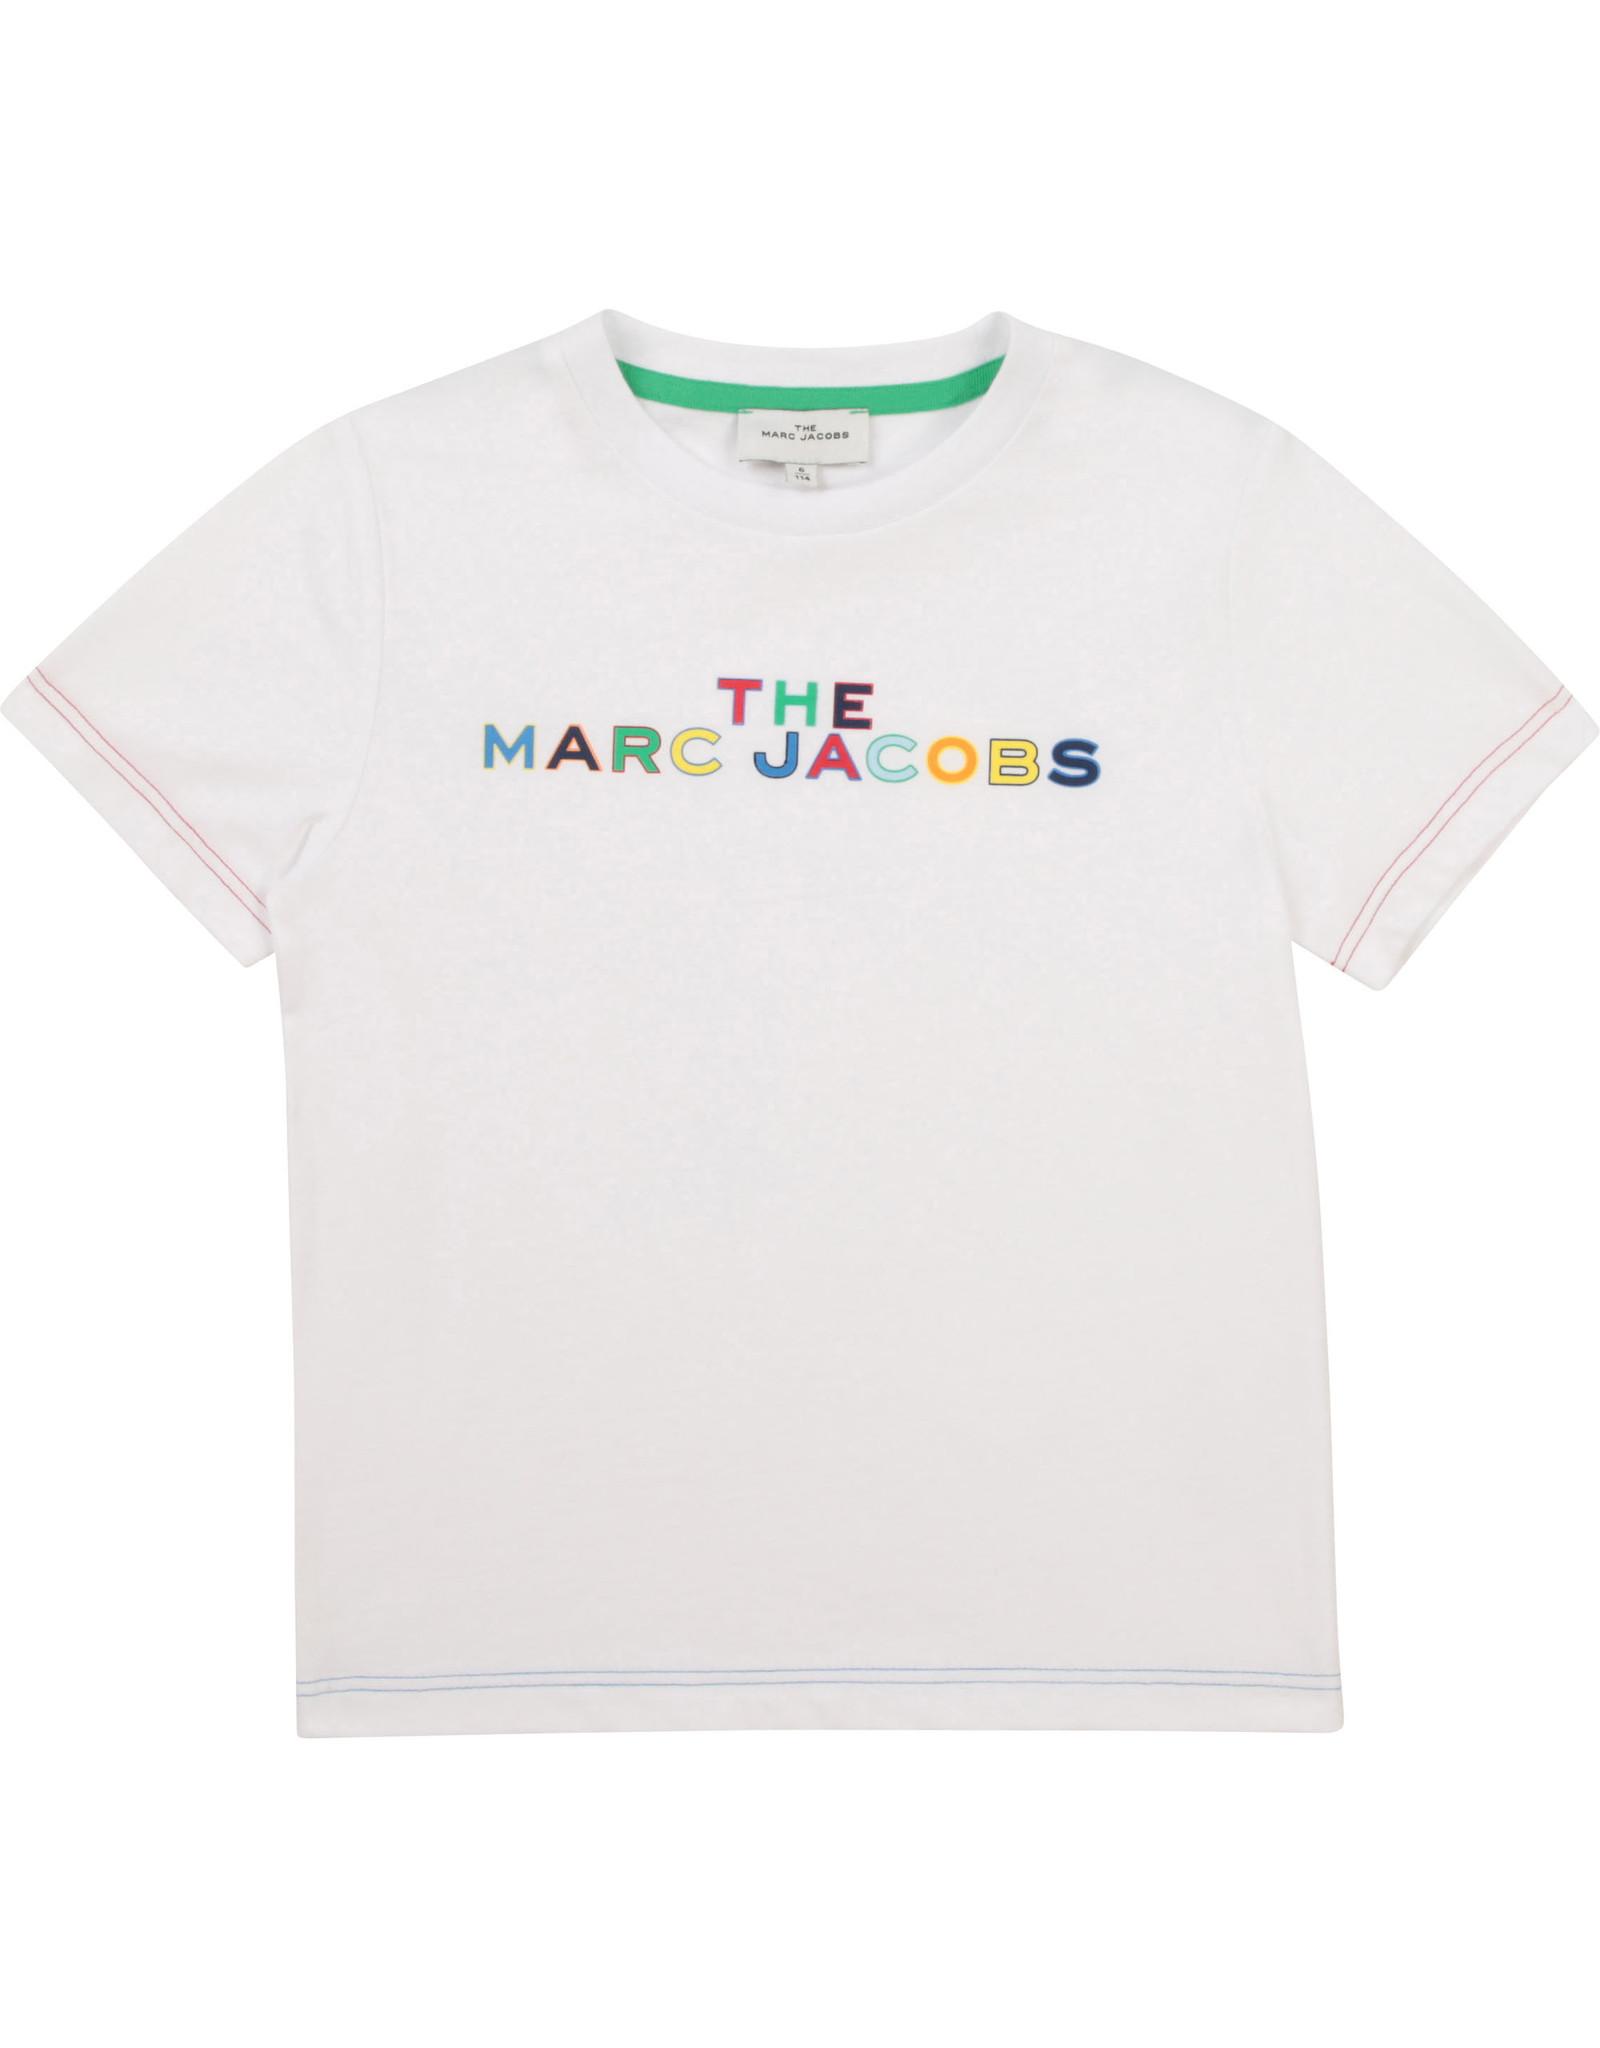 The Marc Jacobs TMJ SS21 W25467 T-shirt